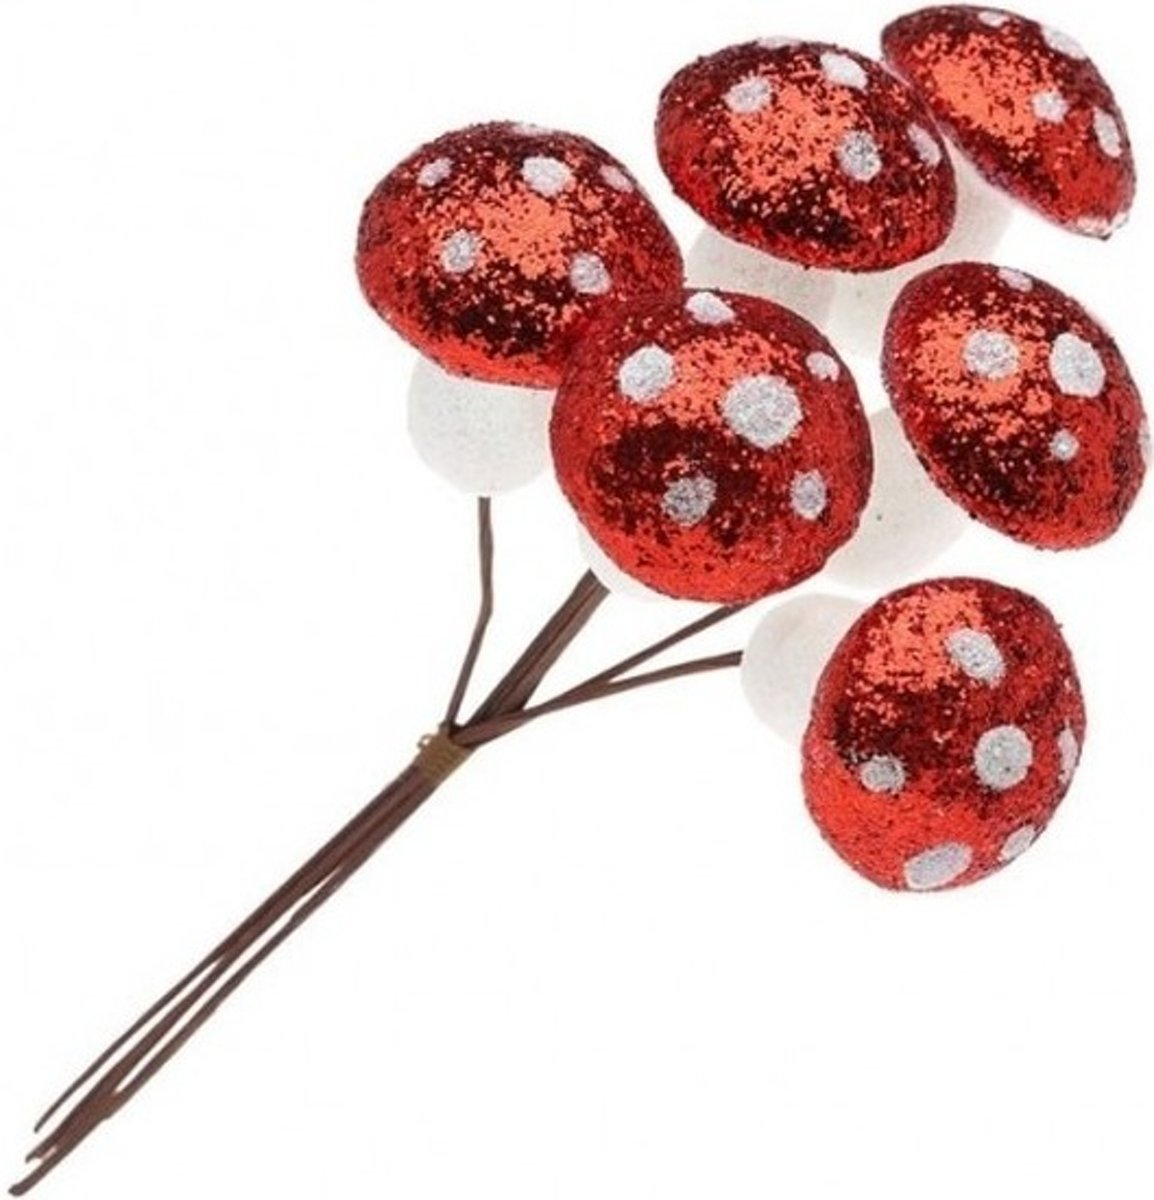 6x Glimmende paddenstoelen glitter instekers rood/wit voor kerststukjes 18 cm - Kerststukje maken onderdelen - Kerstversiering kopen